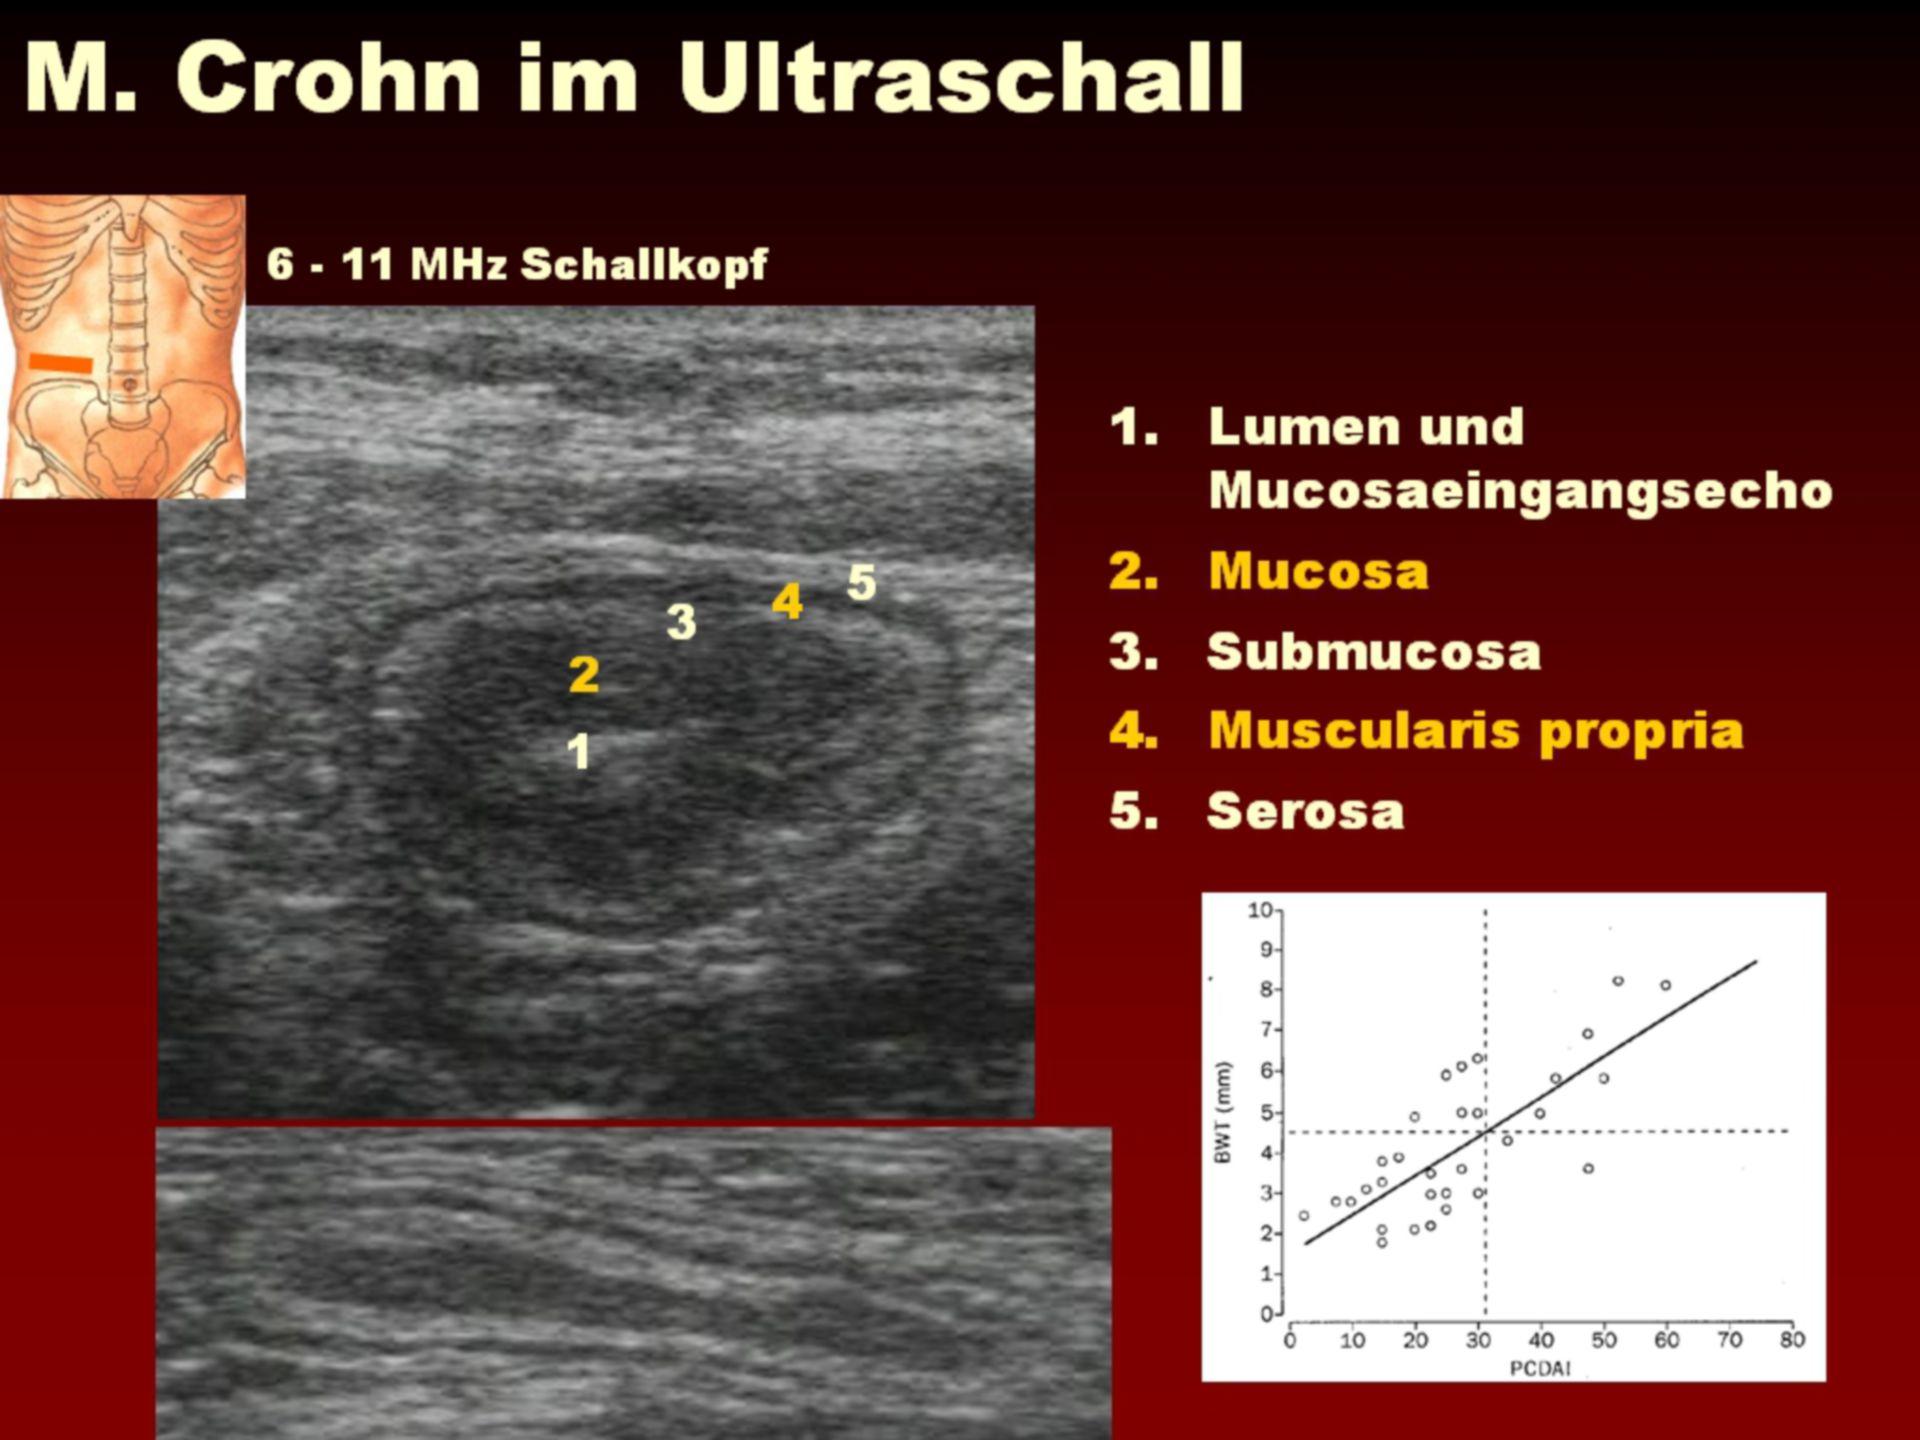 Morbus Crohn im Ultraschall